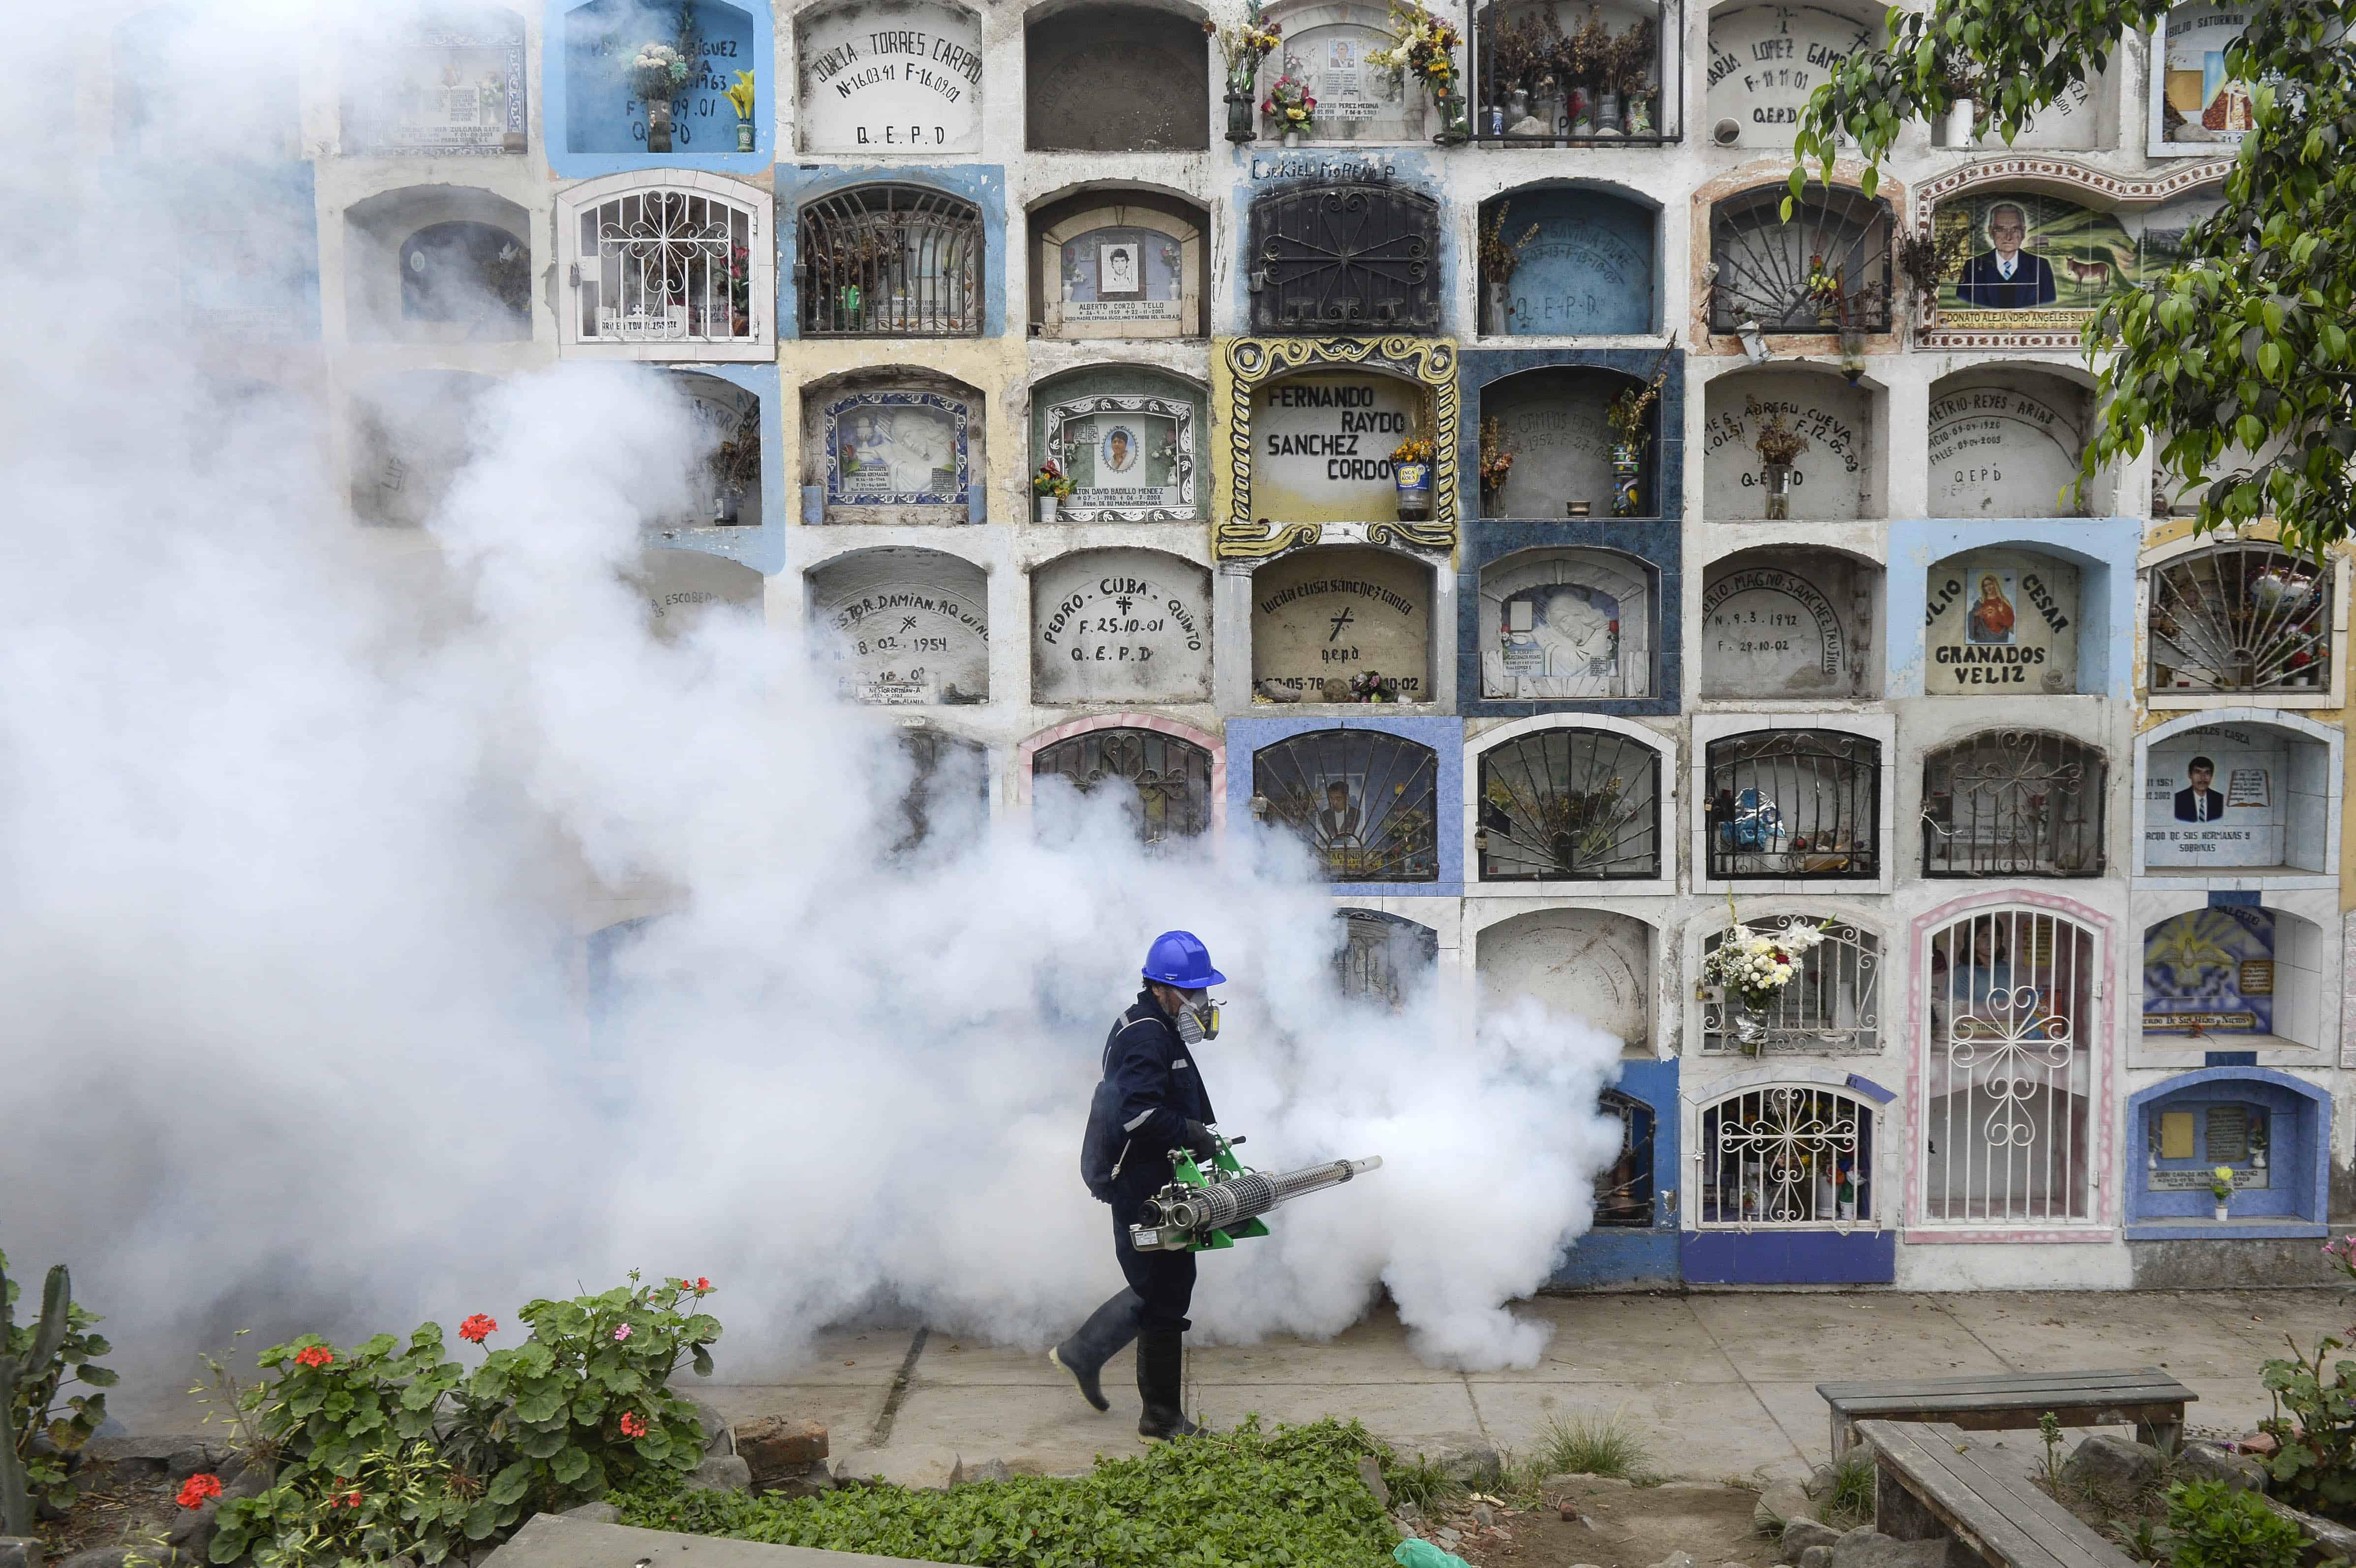 Fumigating in Peru for the zika virus